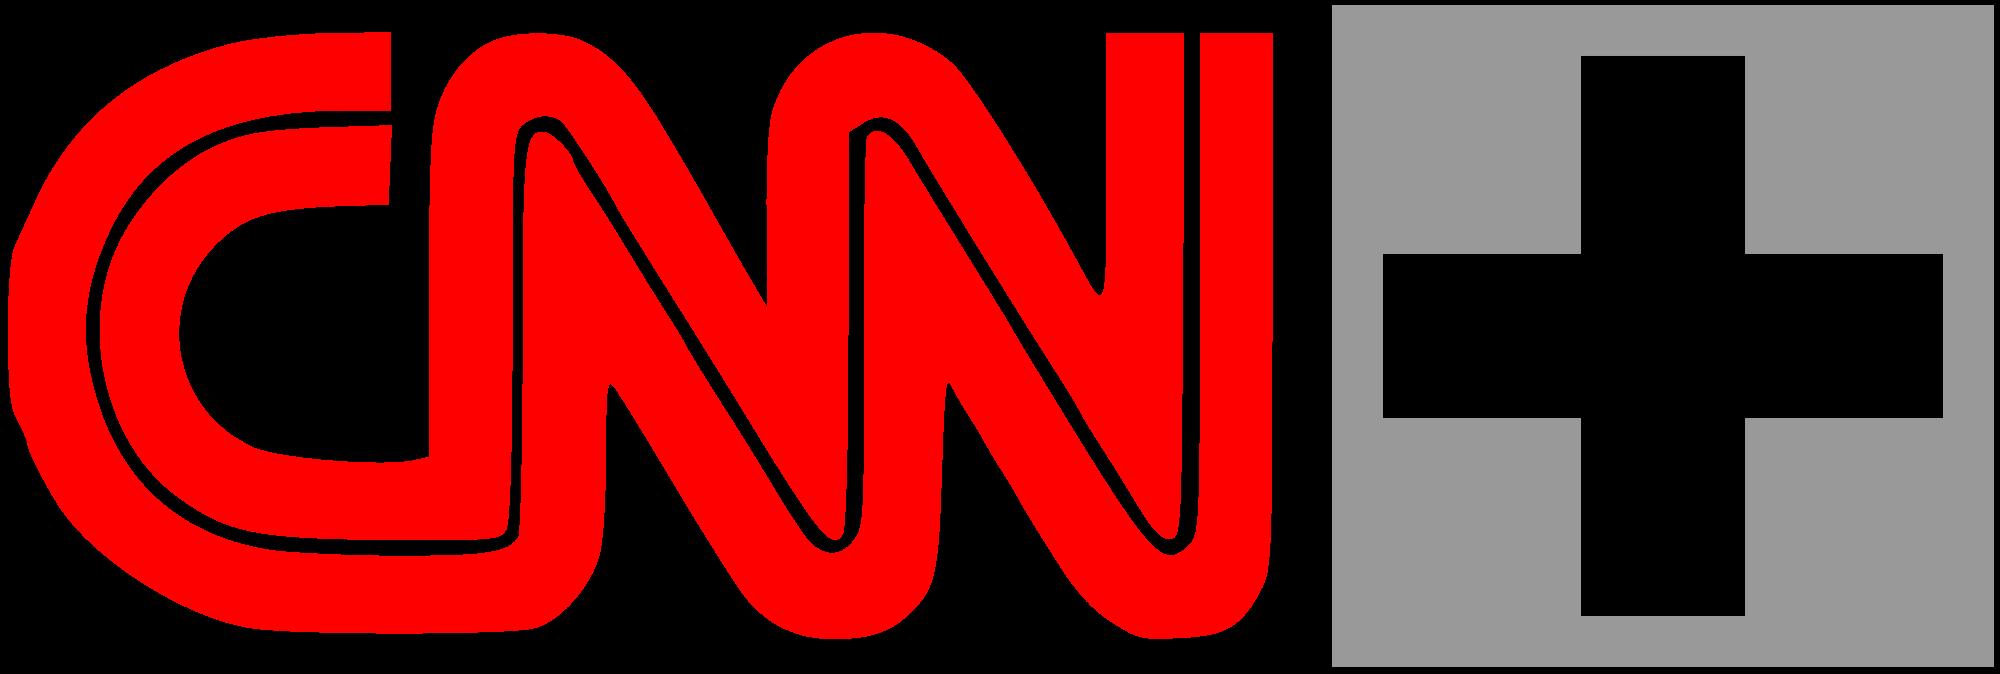 cnnm plus logo png #1813